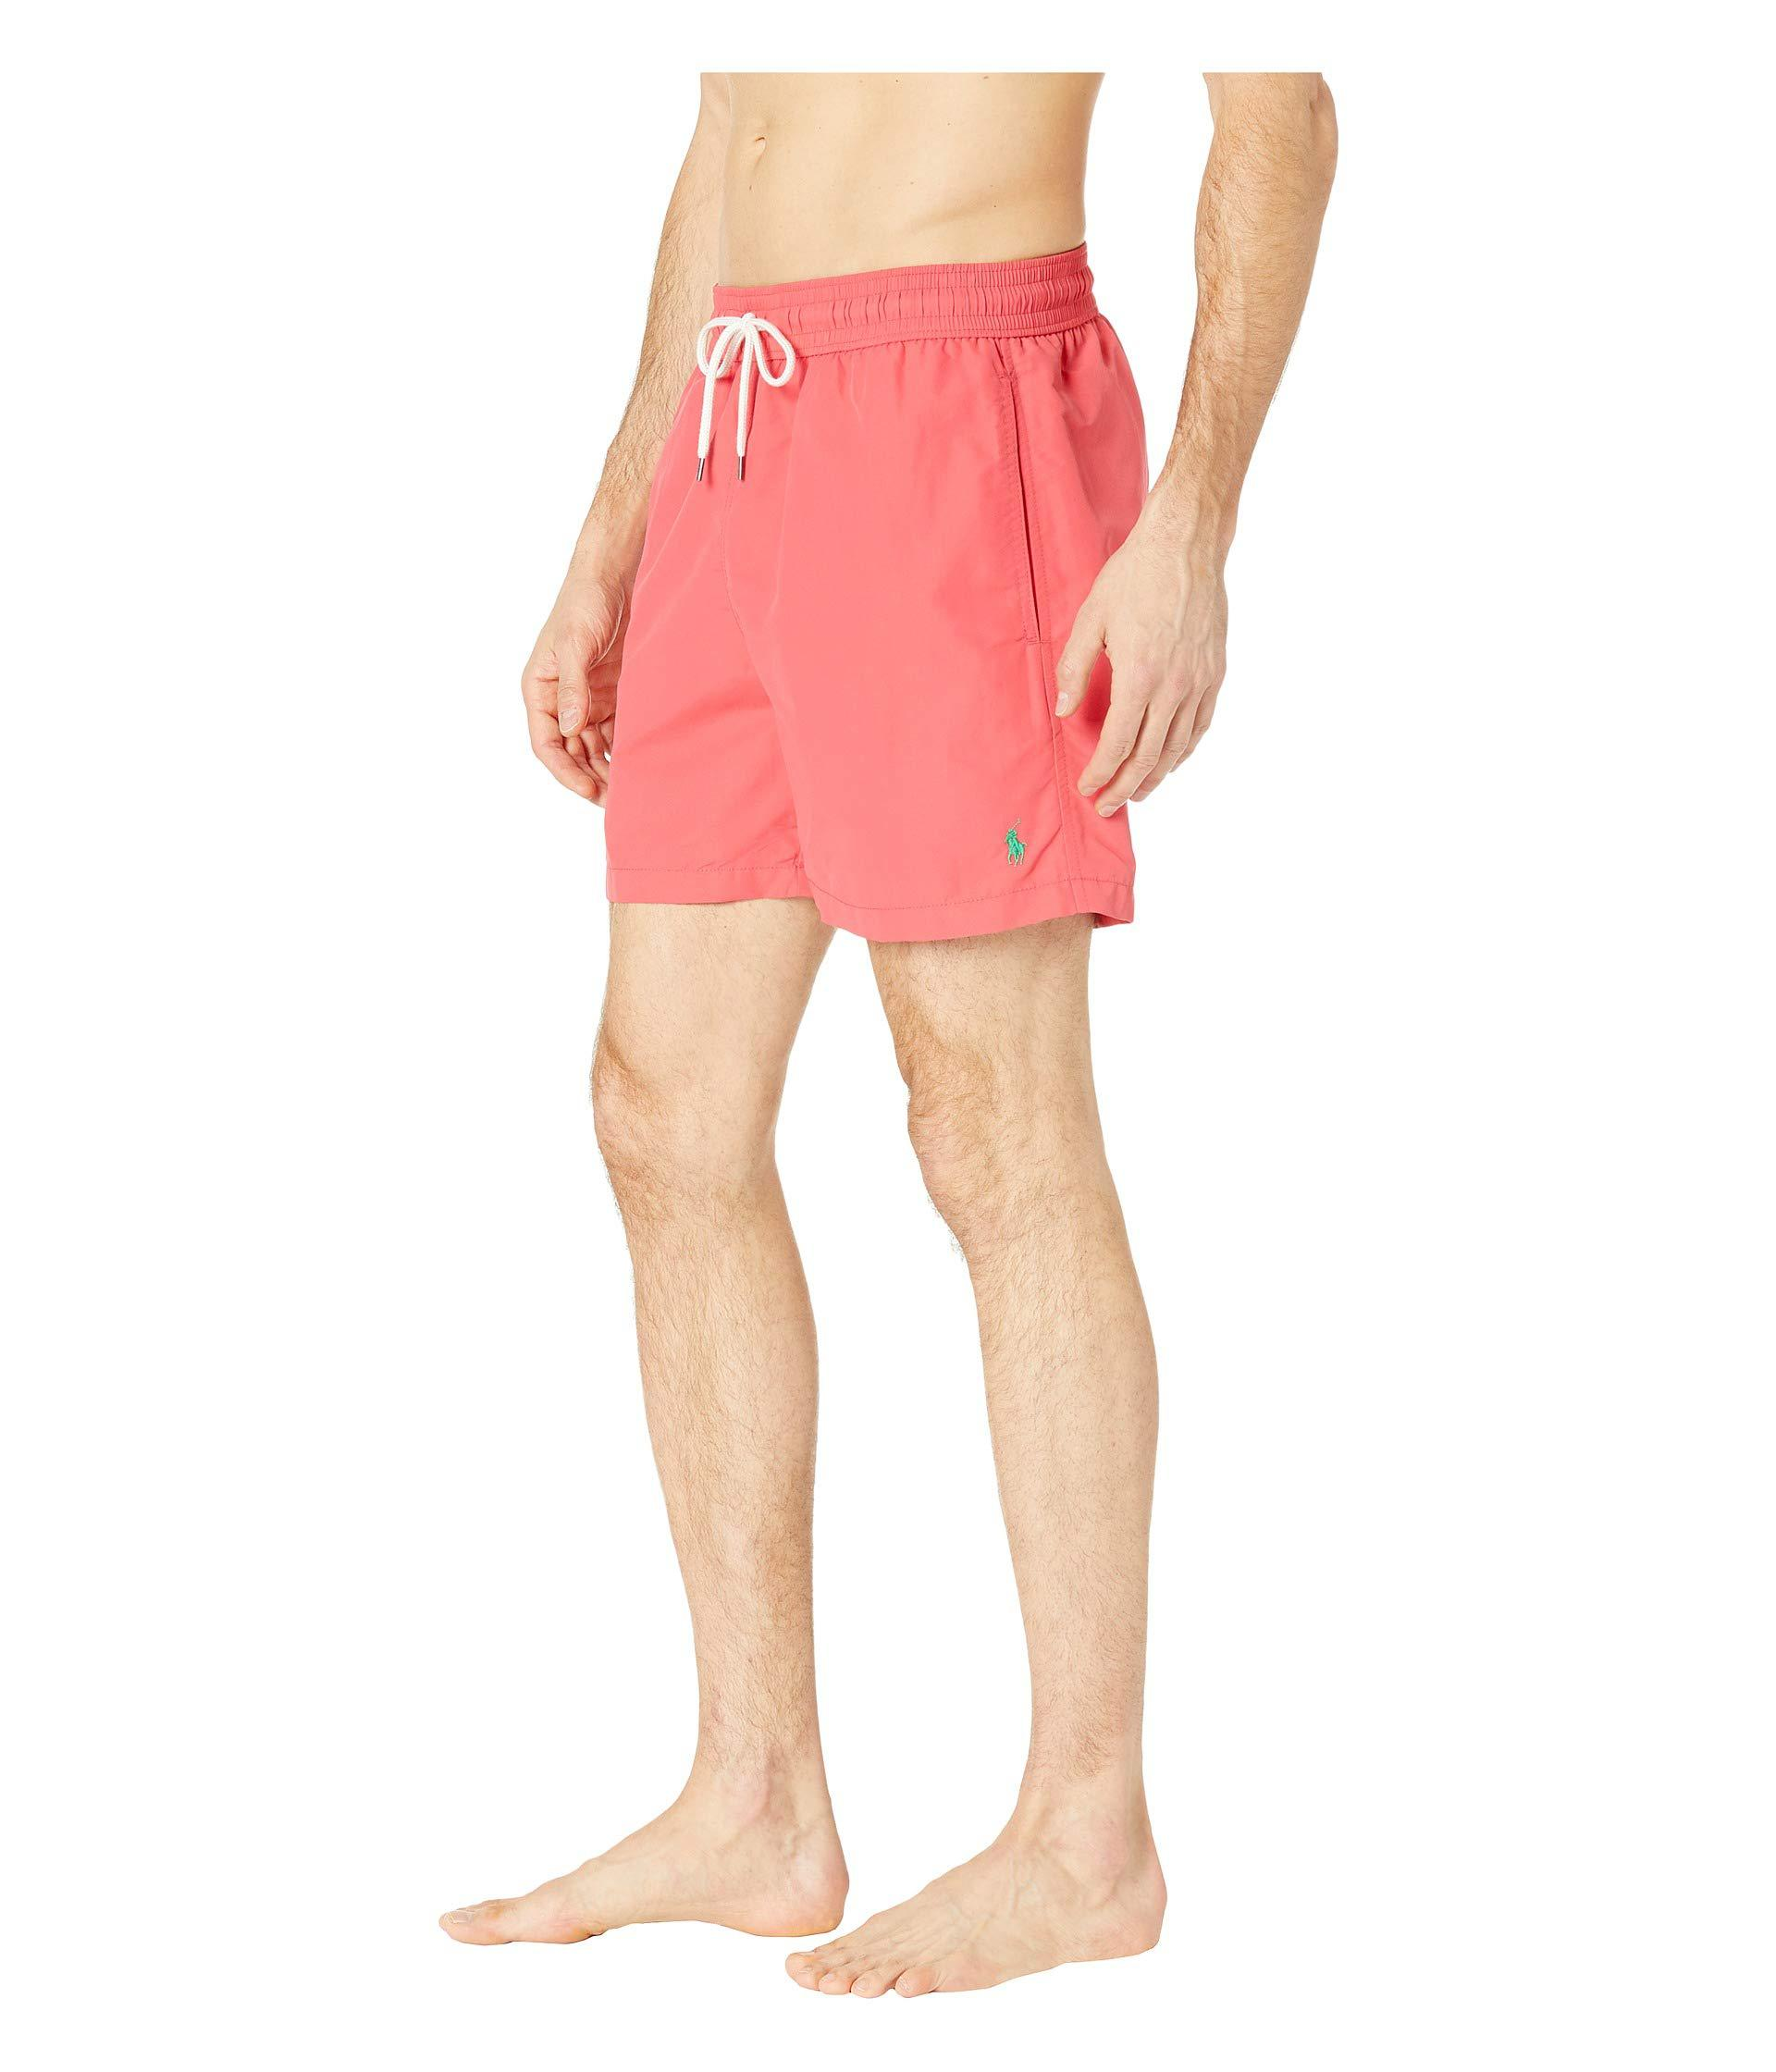 9bf5aff1d7 ... best price lyst polo ralph lauren nylon traveler swim shorts cactus  flower mens swimwear in pink